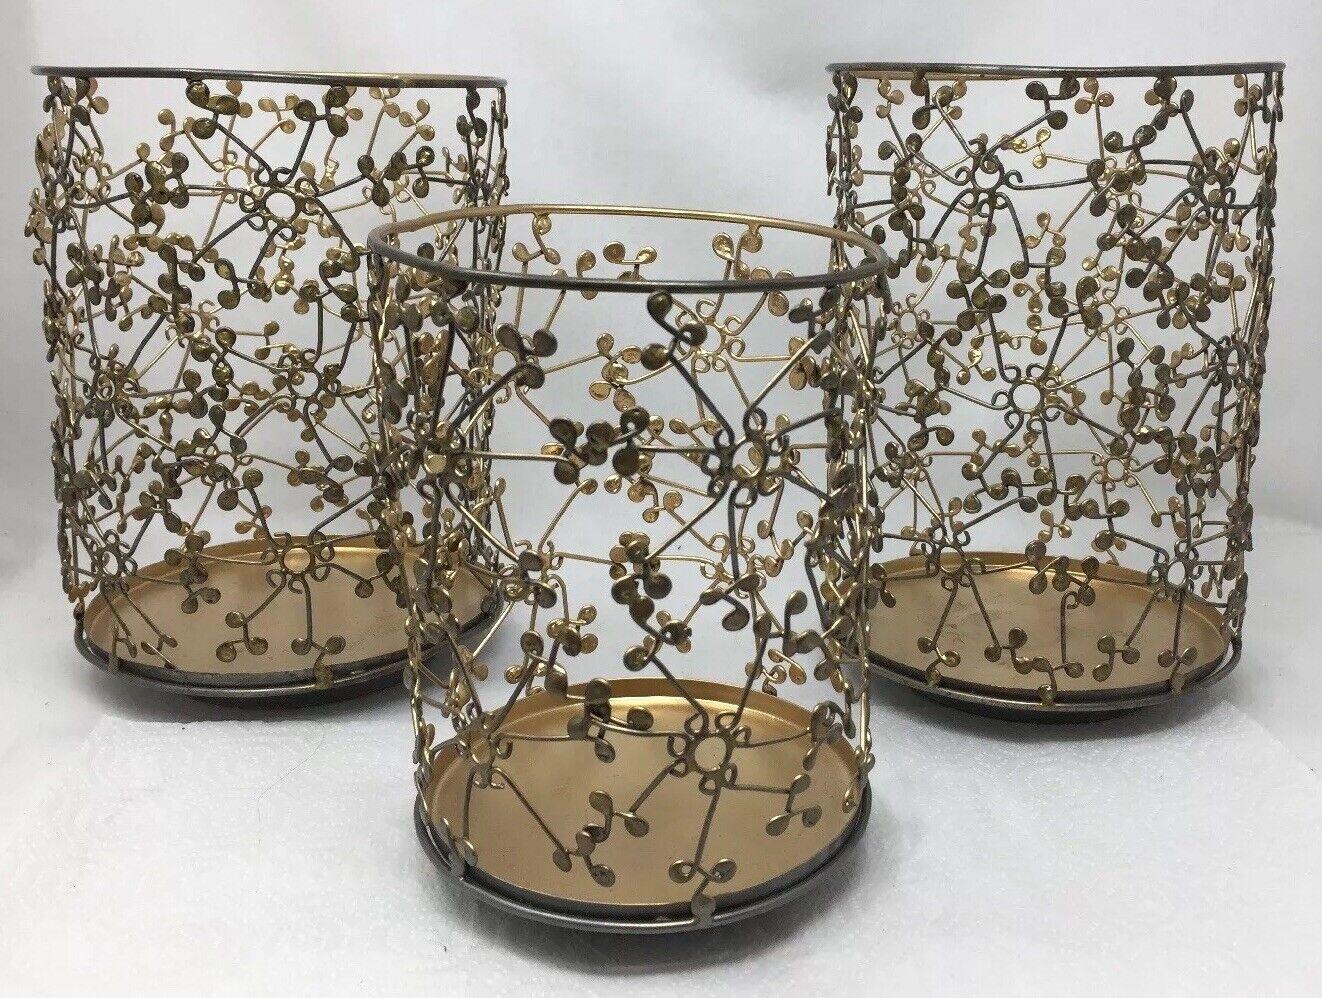 Bad & Körper Arbeiten Elemente Gold Punkte Draht Metall Lichtkörper Kerzenhalter